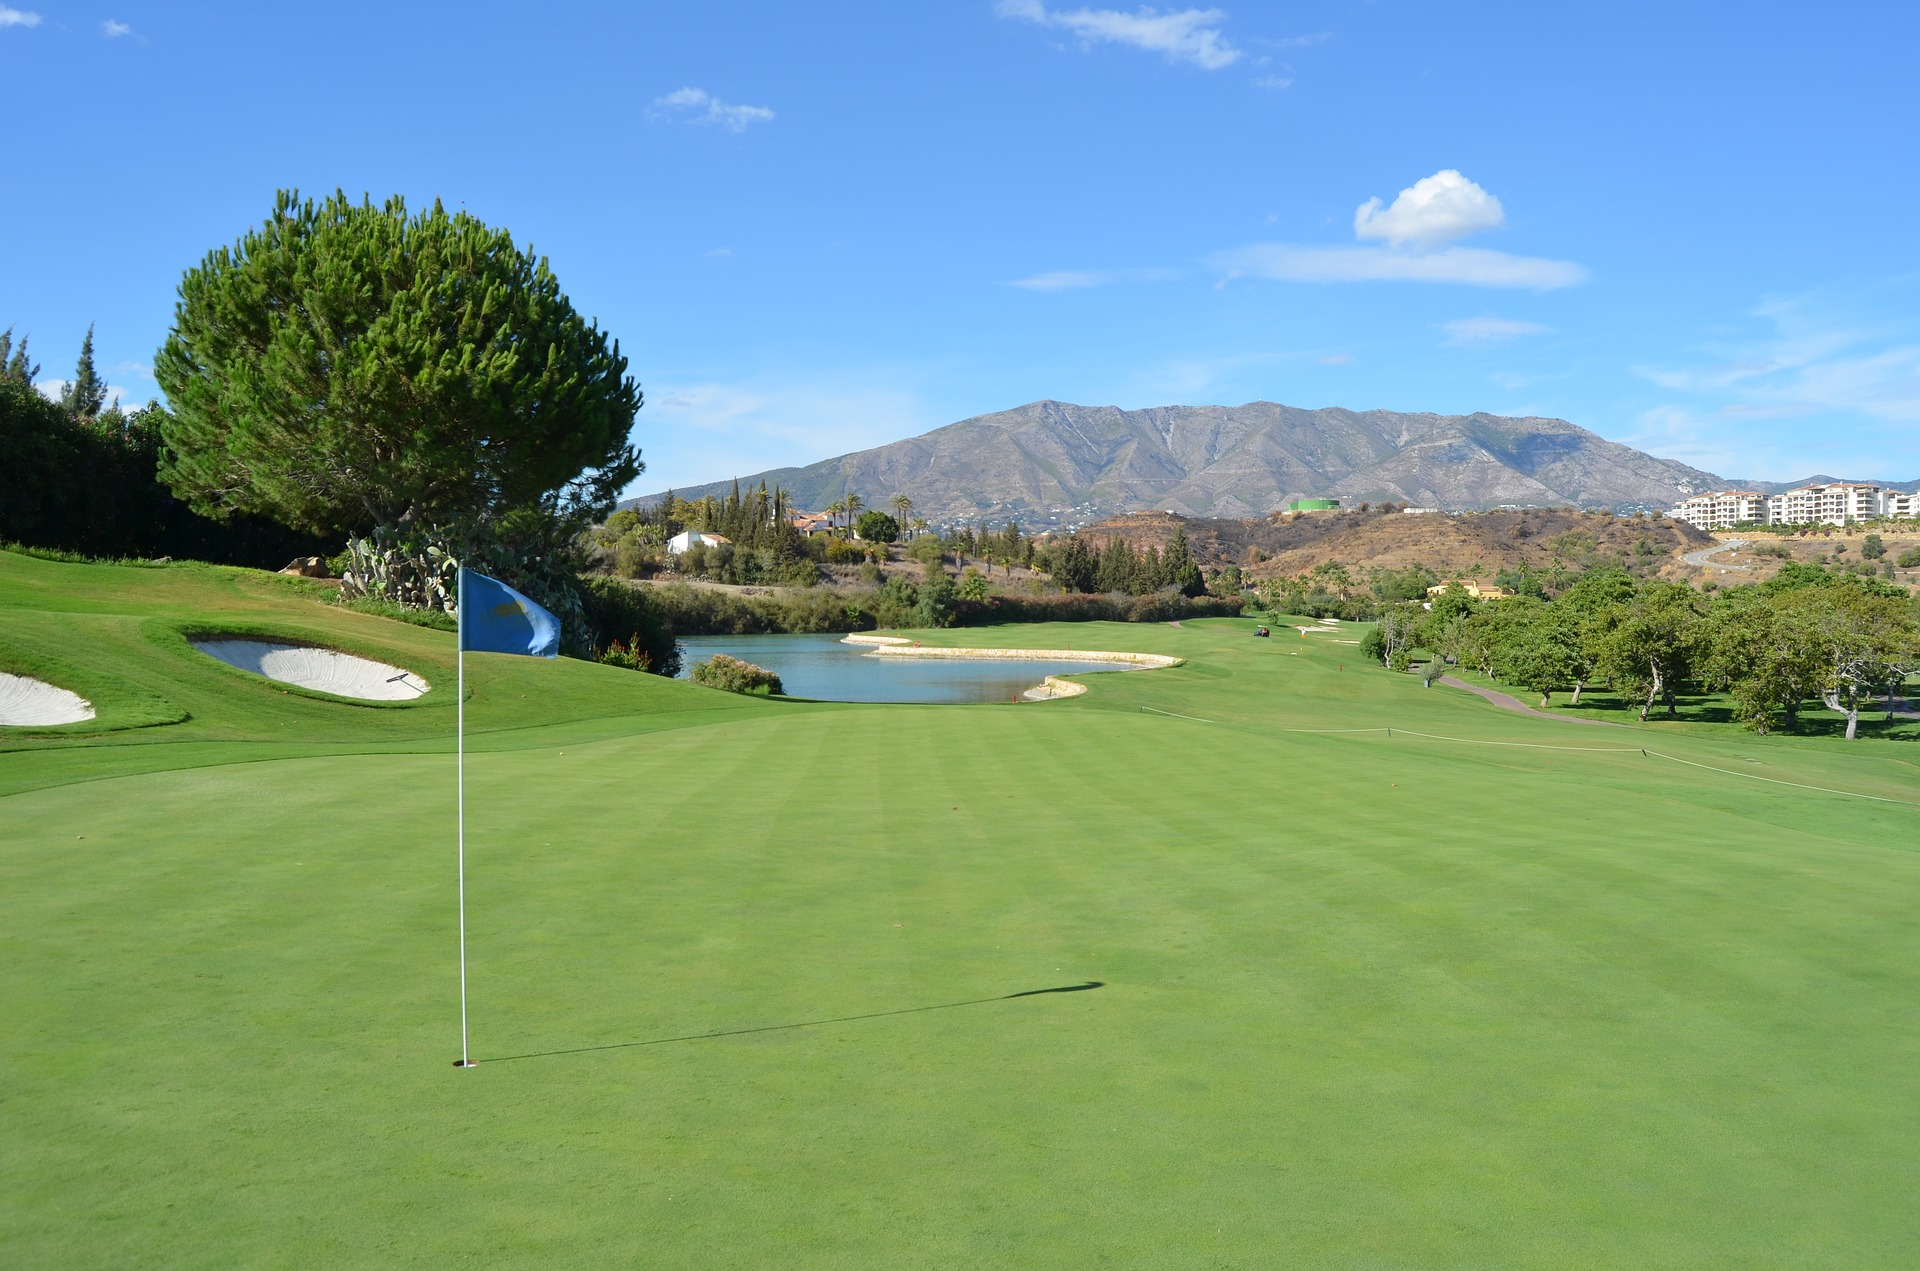 golf-1649263_1920